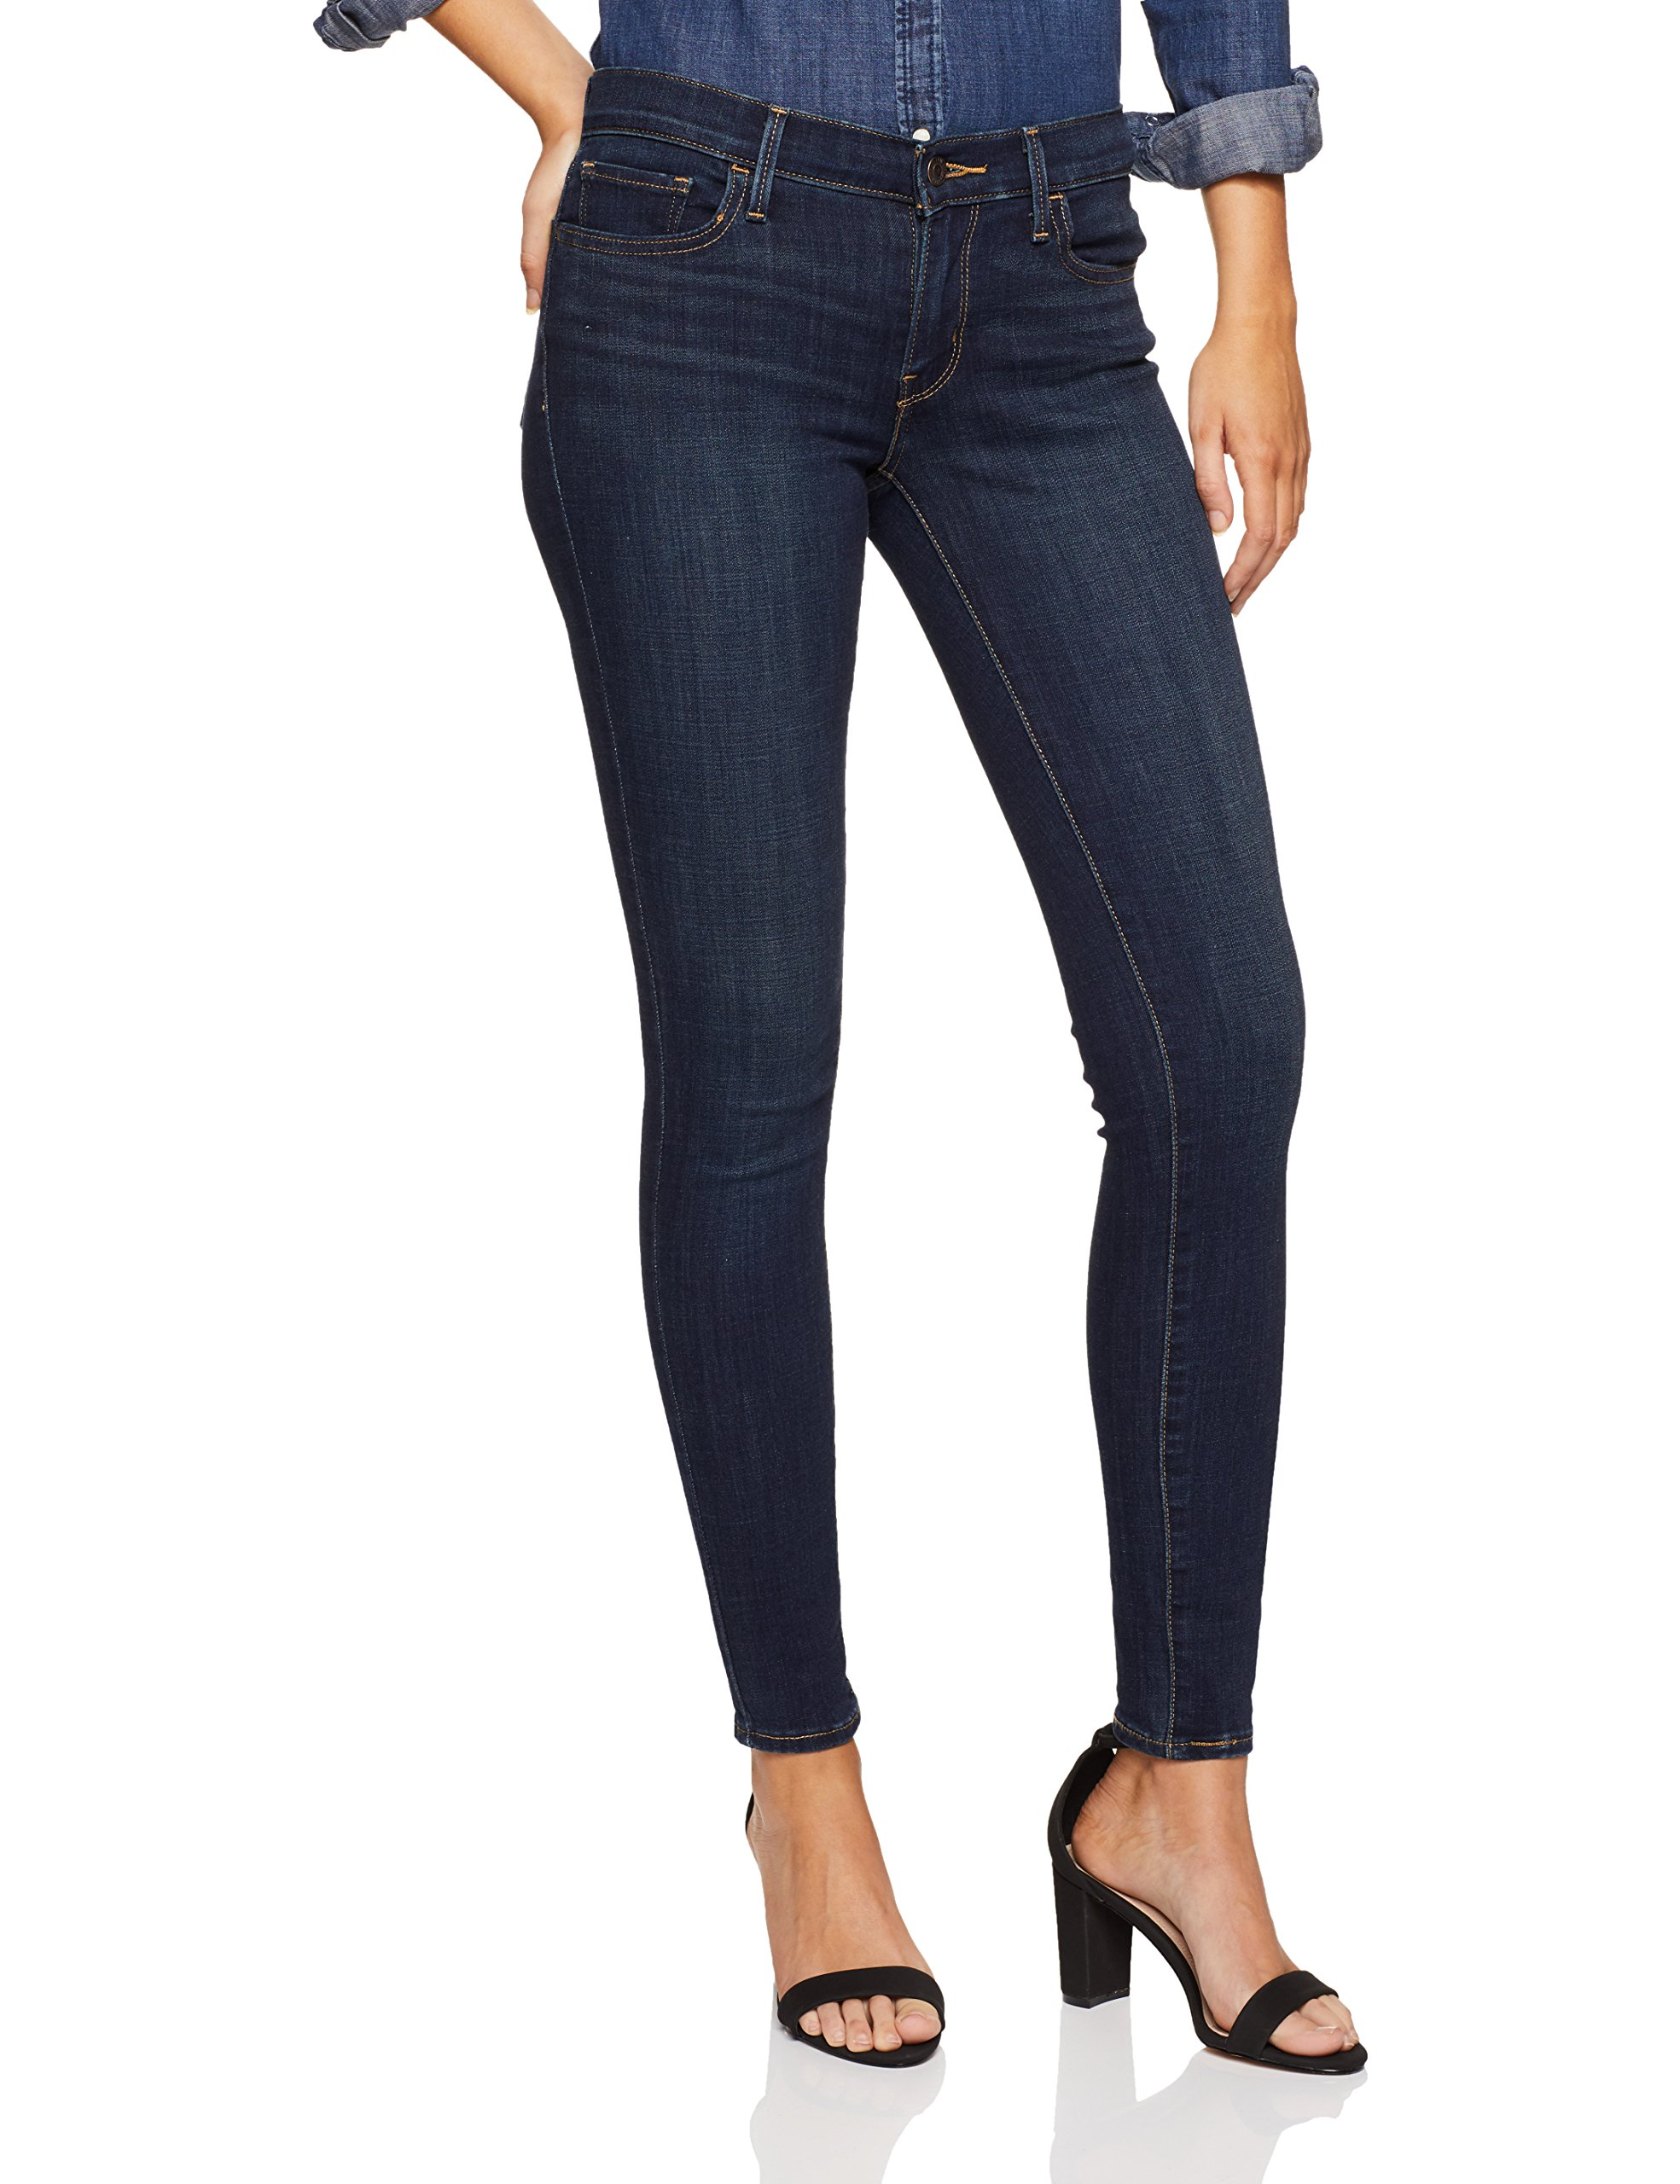 Levi's Women's 710 Super Skinny Jeans, Evolution, 30 (US 10) R